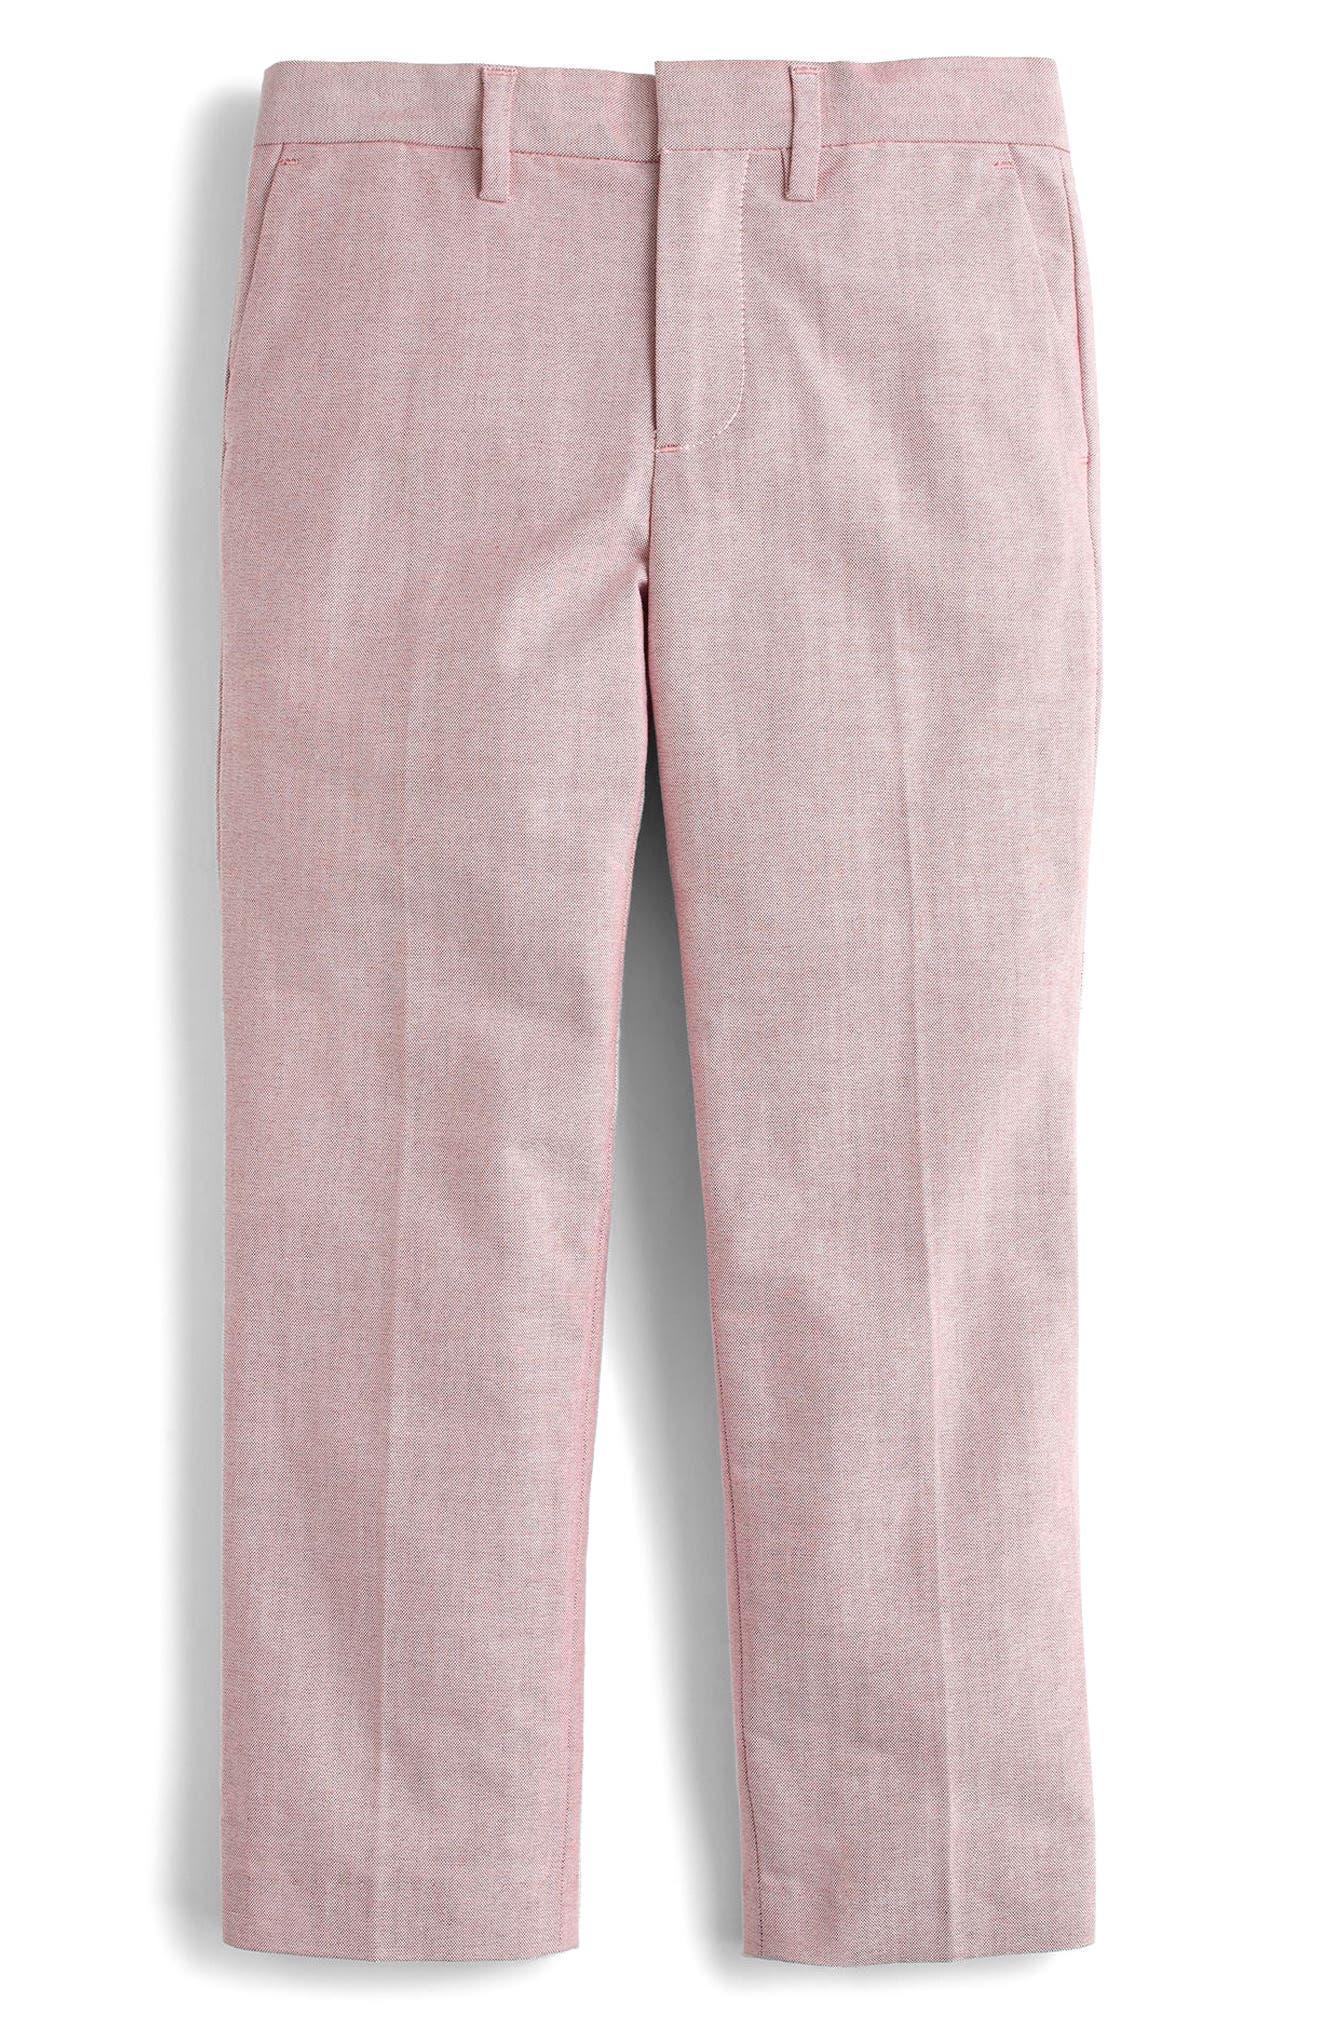 CREWCUTS BY J.CREW,                             Ludlow Stretch Oxford Suit Pants,                             Main thumbnail 1, color,                             600